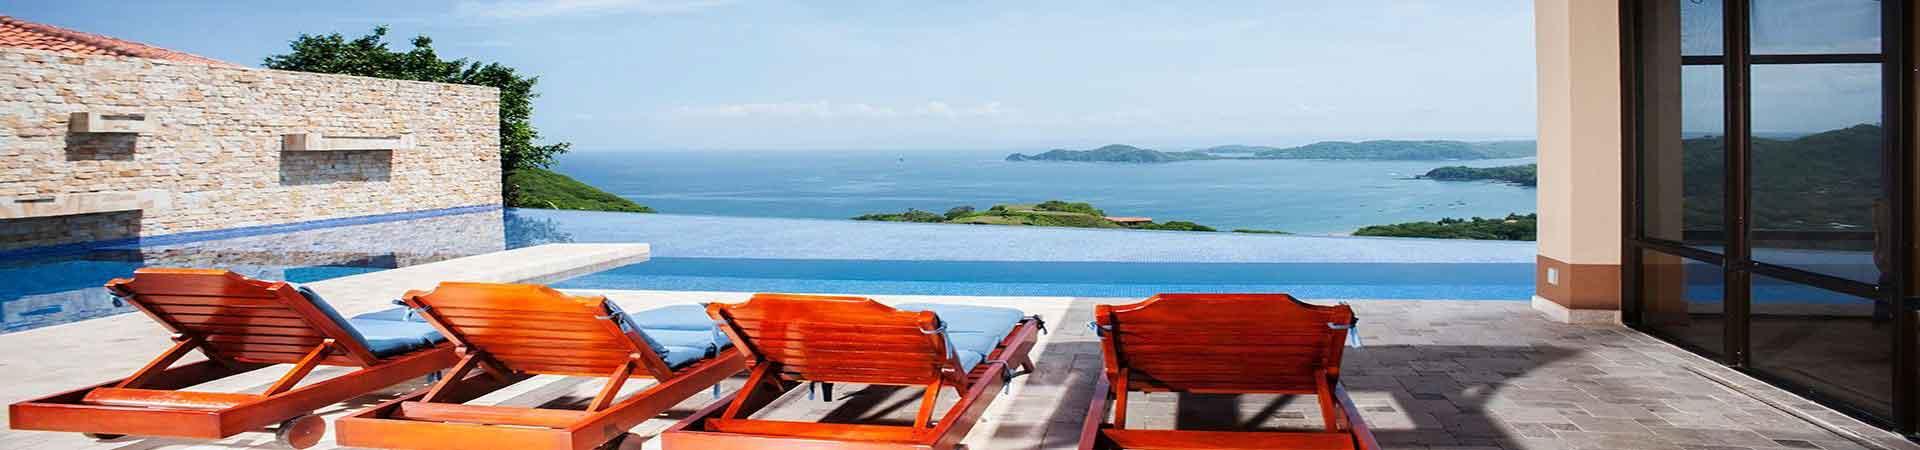 https://www.goodmorningtenerife.com/wp-content/uploads/2016/07/03_tenerife-island-rentals_1920x450-good-morning-tenerife.jpg